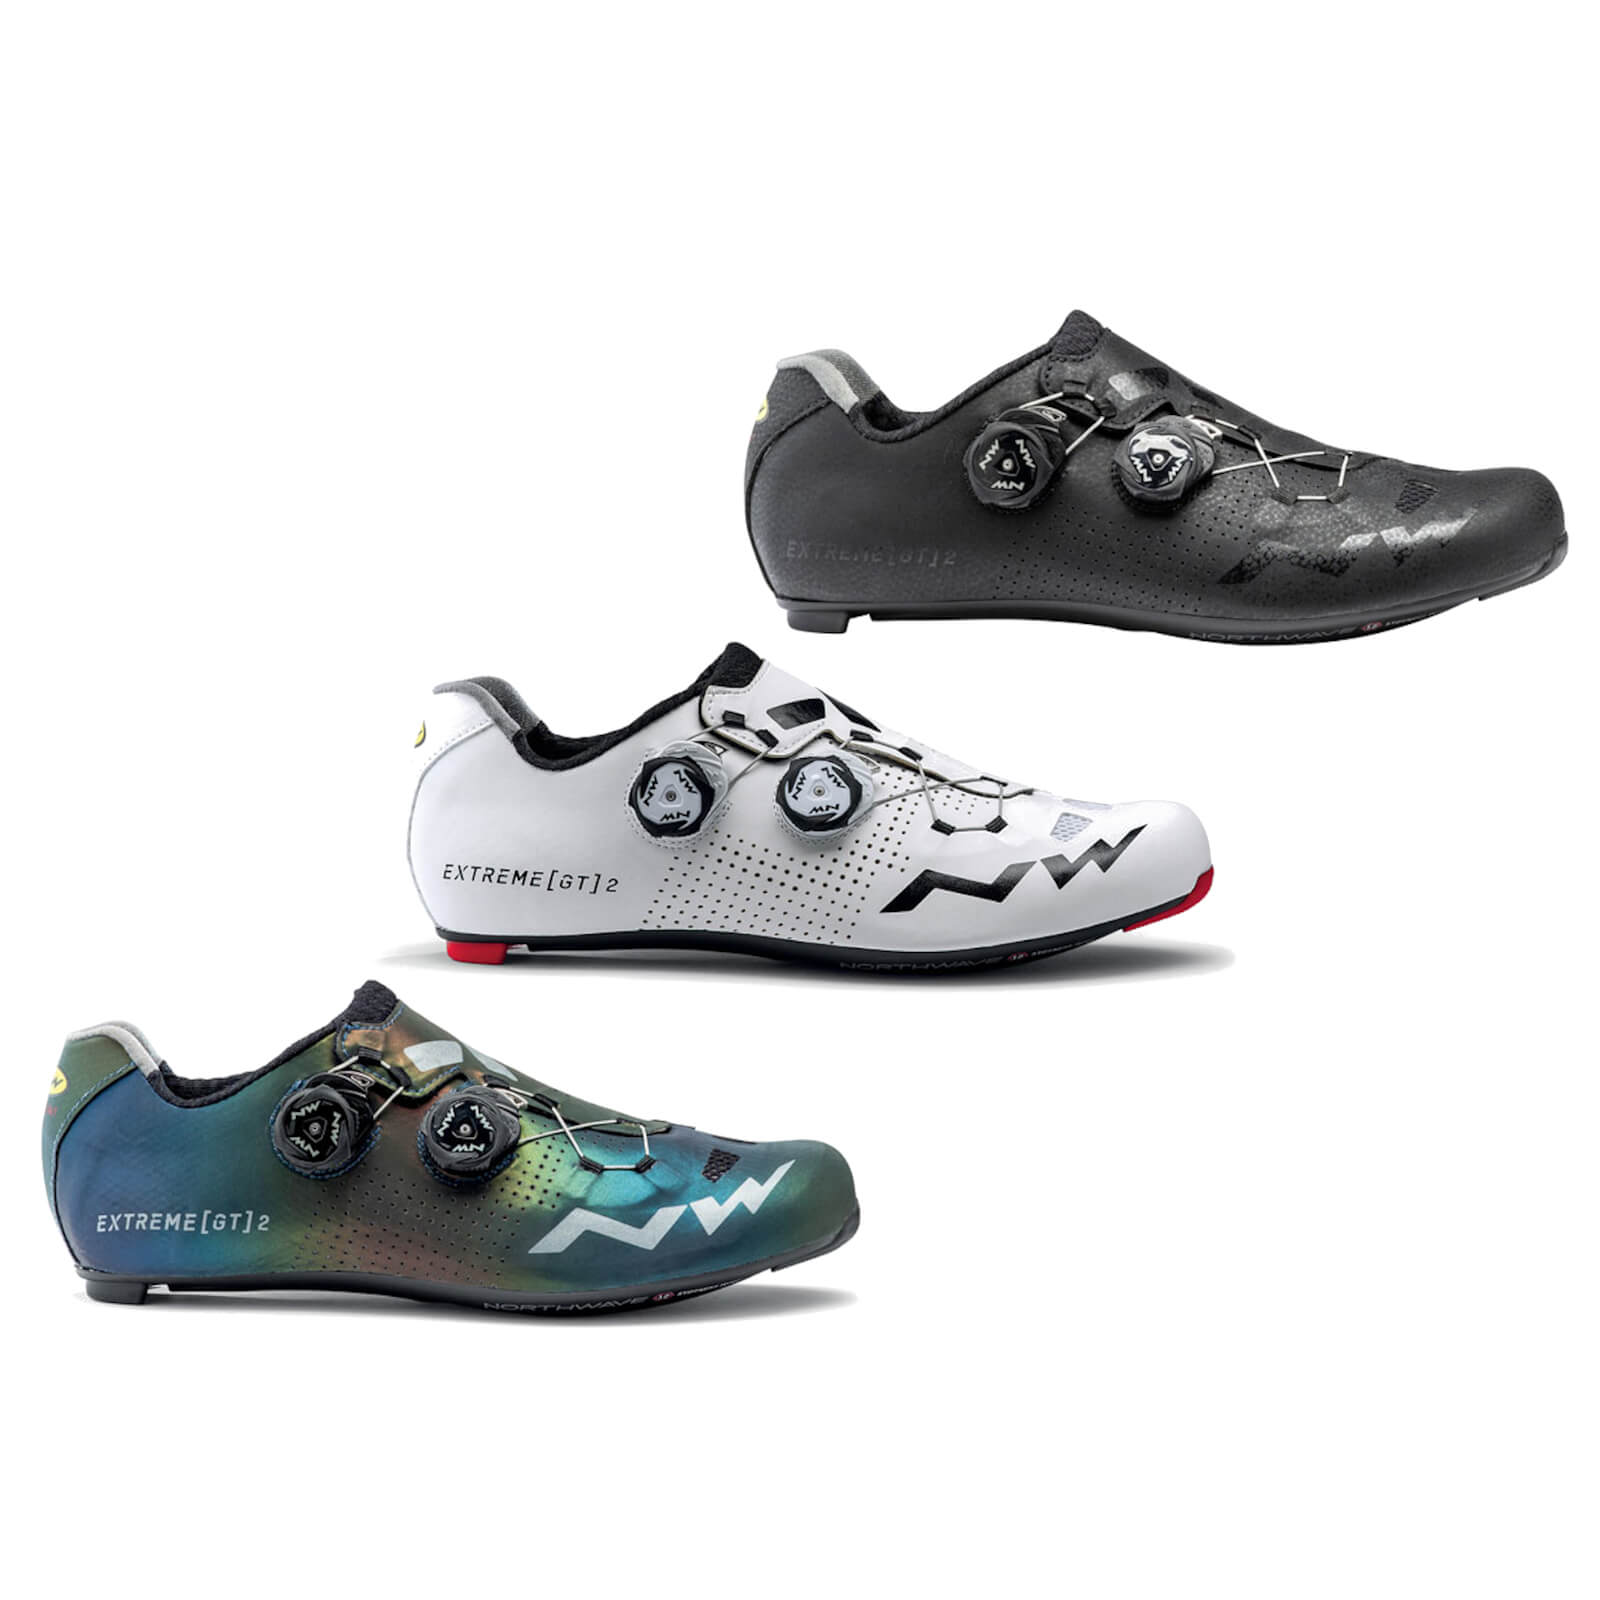 Northwave Extreme GT 2 Carbon Road Shoes - EU 47 - Schwarz